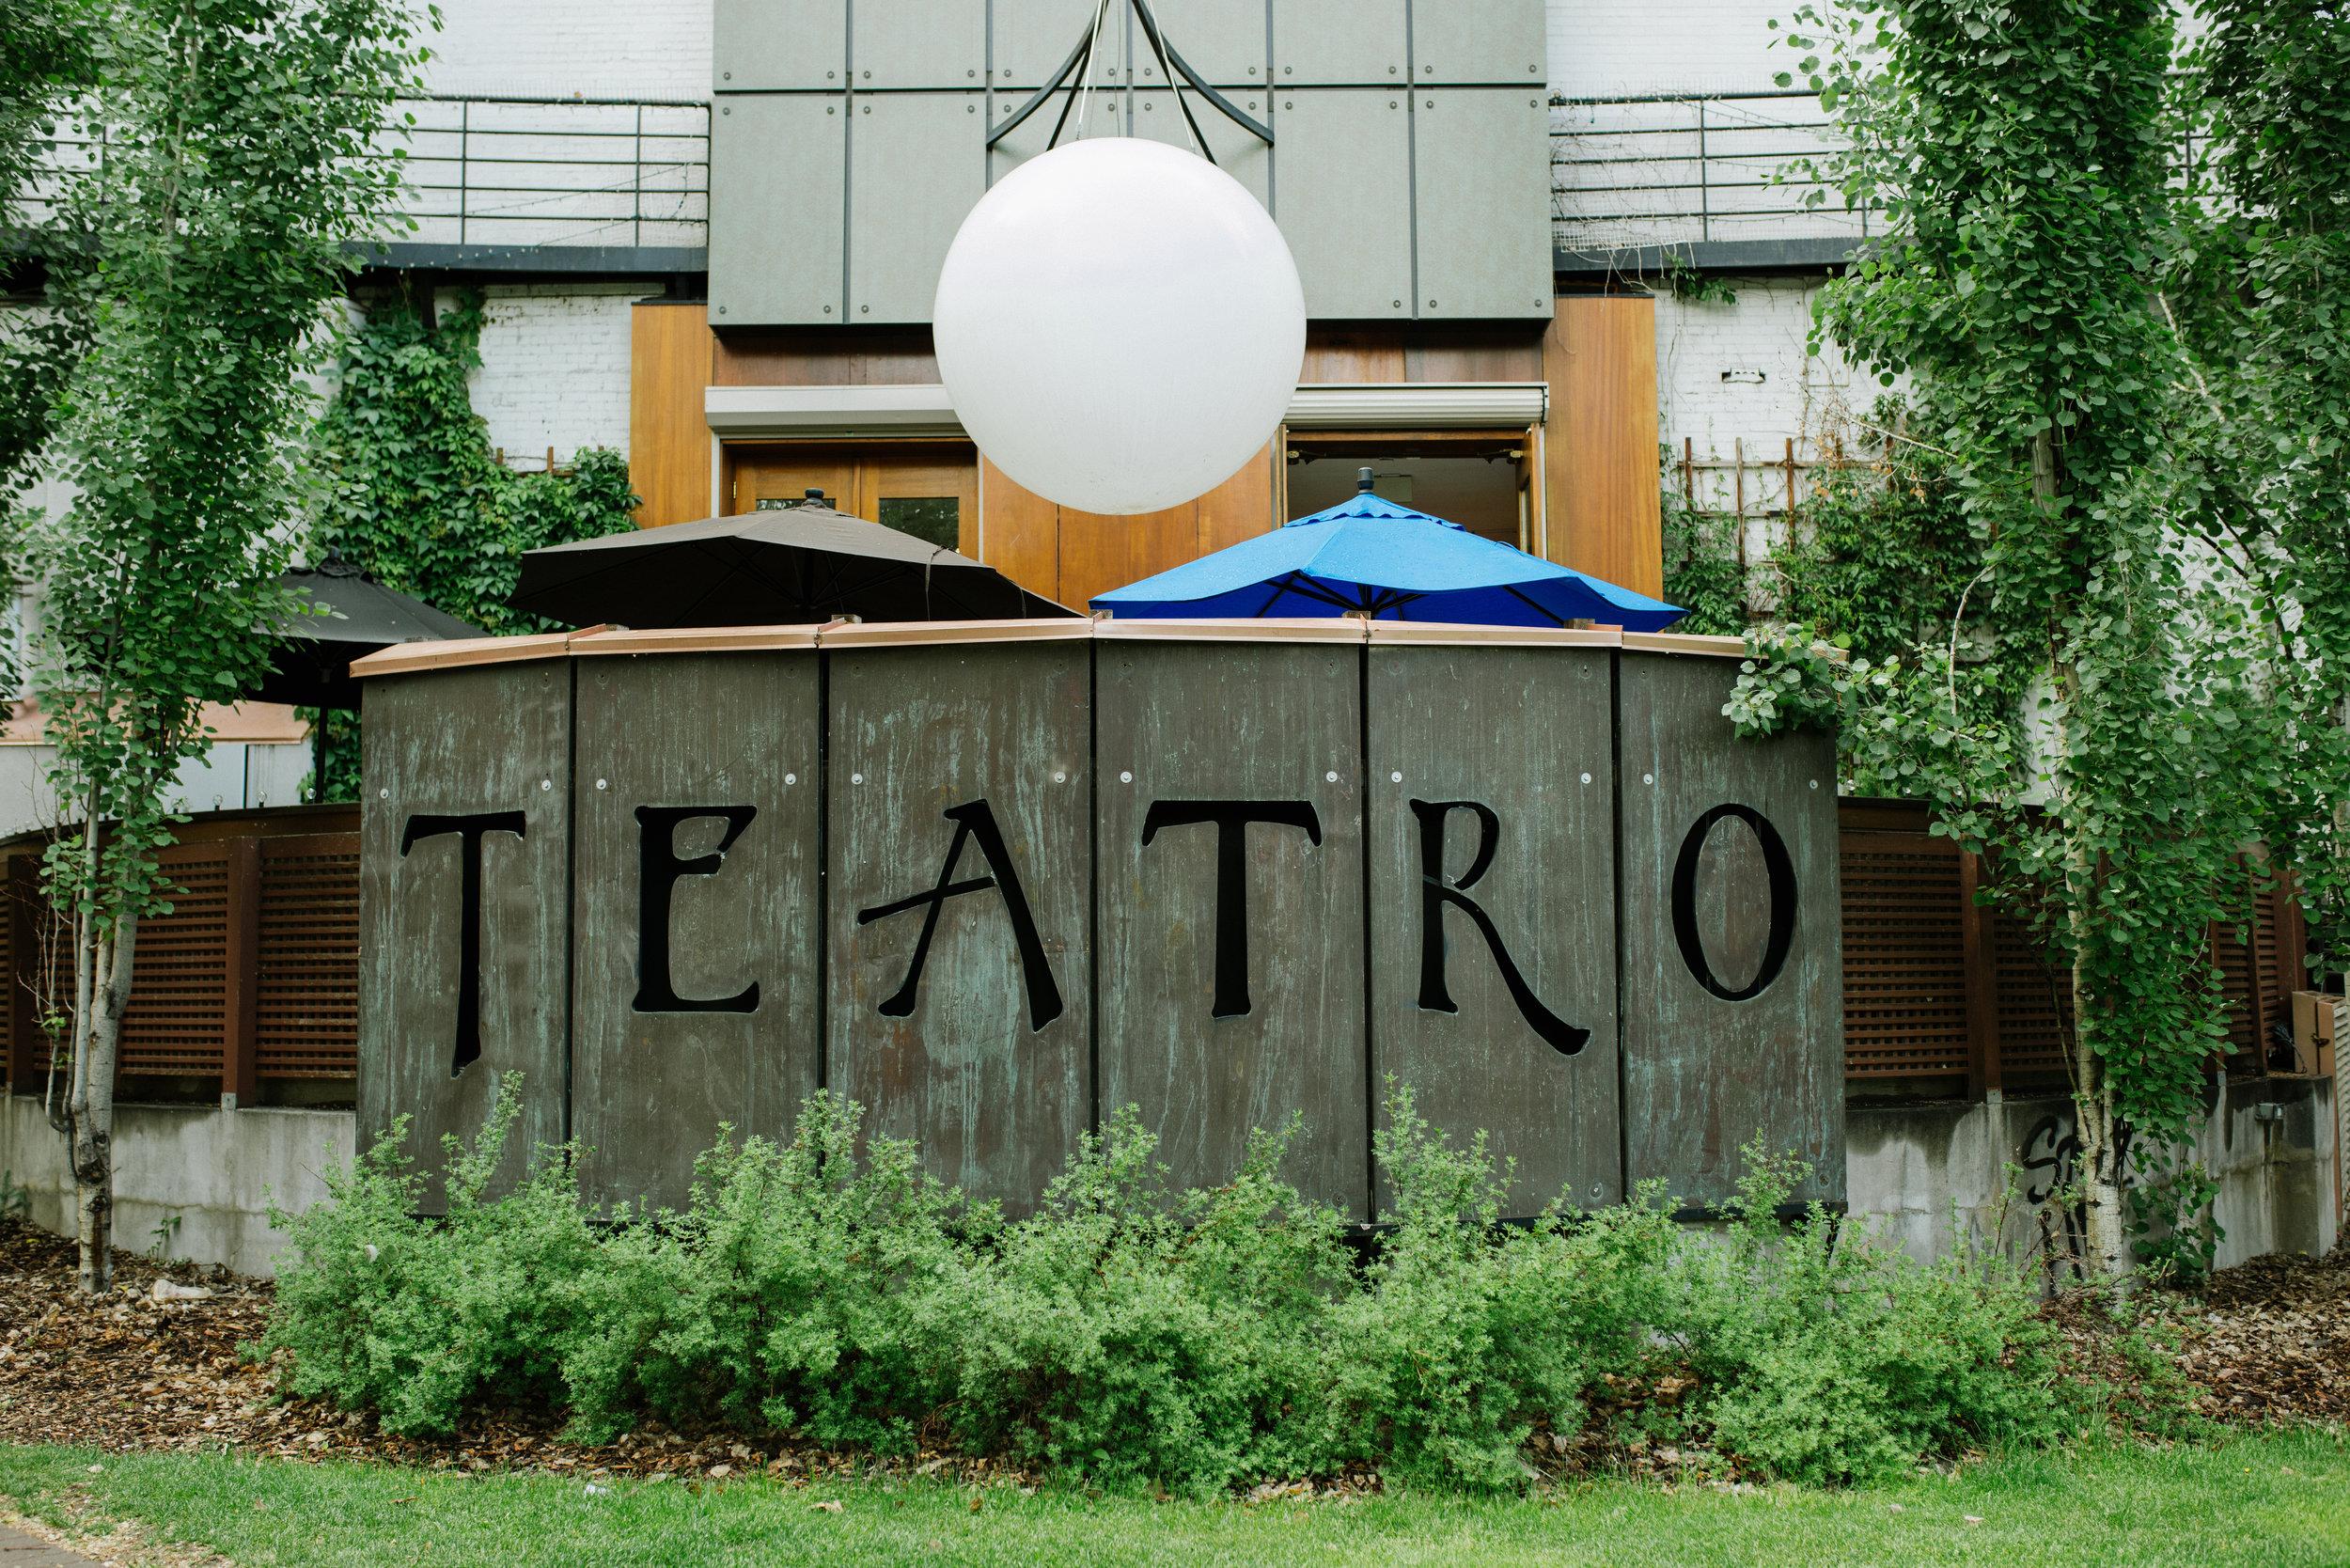 Teatro_Wedding_Calgary_Wedding_Photography_Vanessa_Tom_Married_2018_HR324.jpg